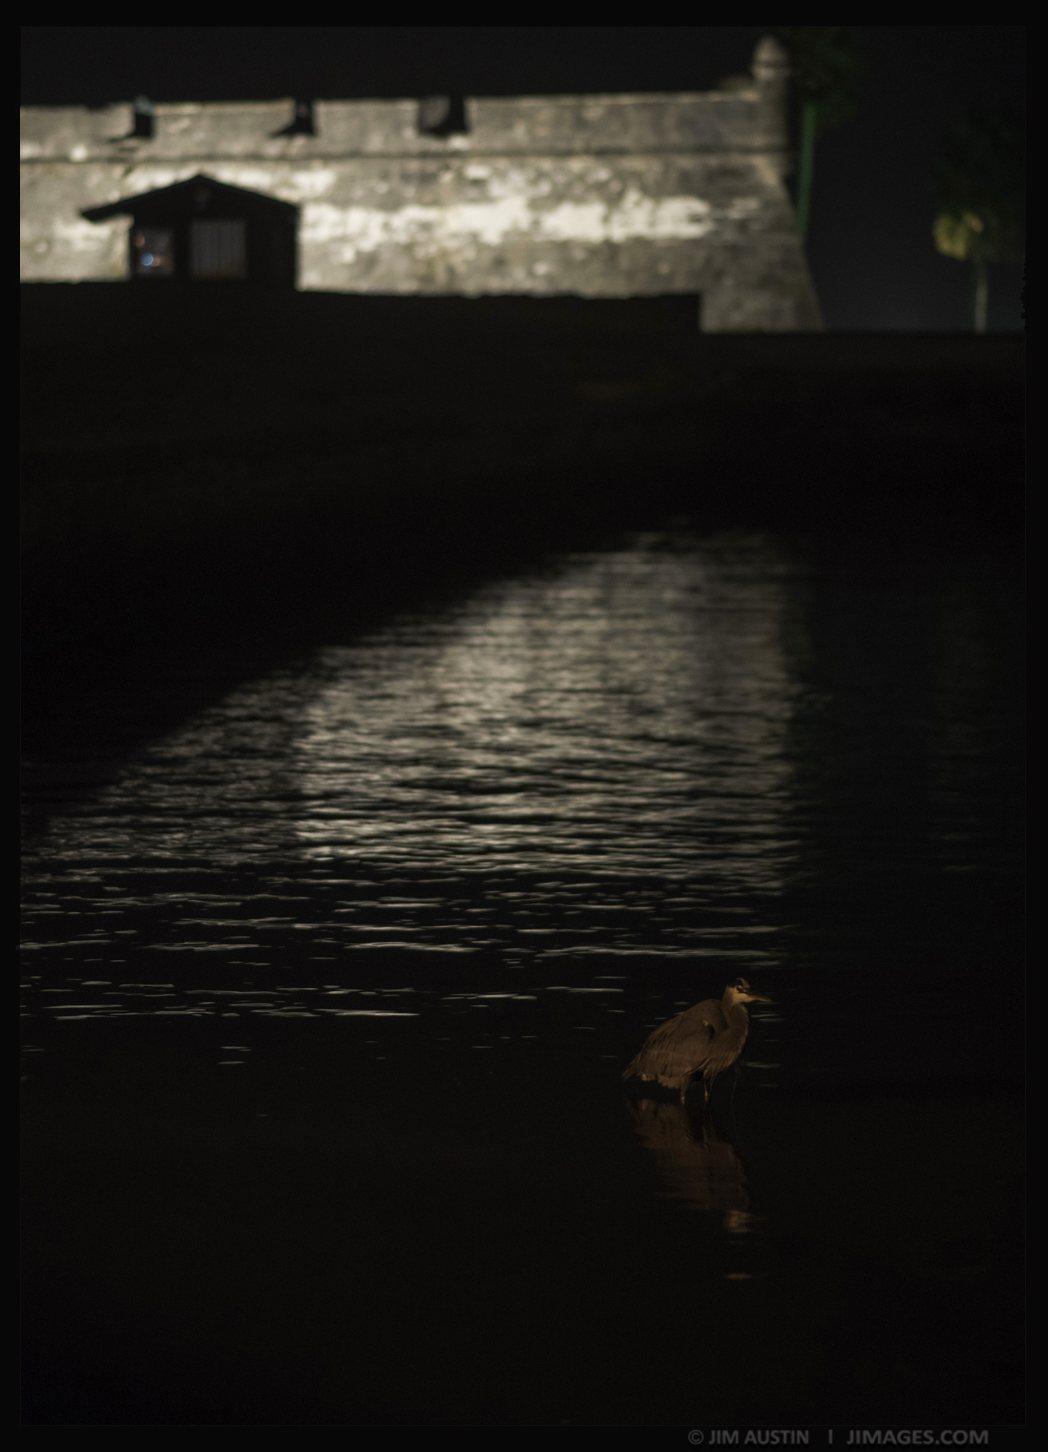 jim-austin-jimages-nikon-three-lenses-heron-fort-matanzas